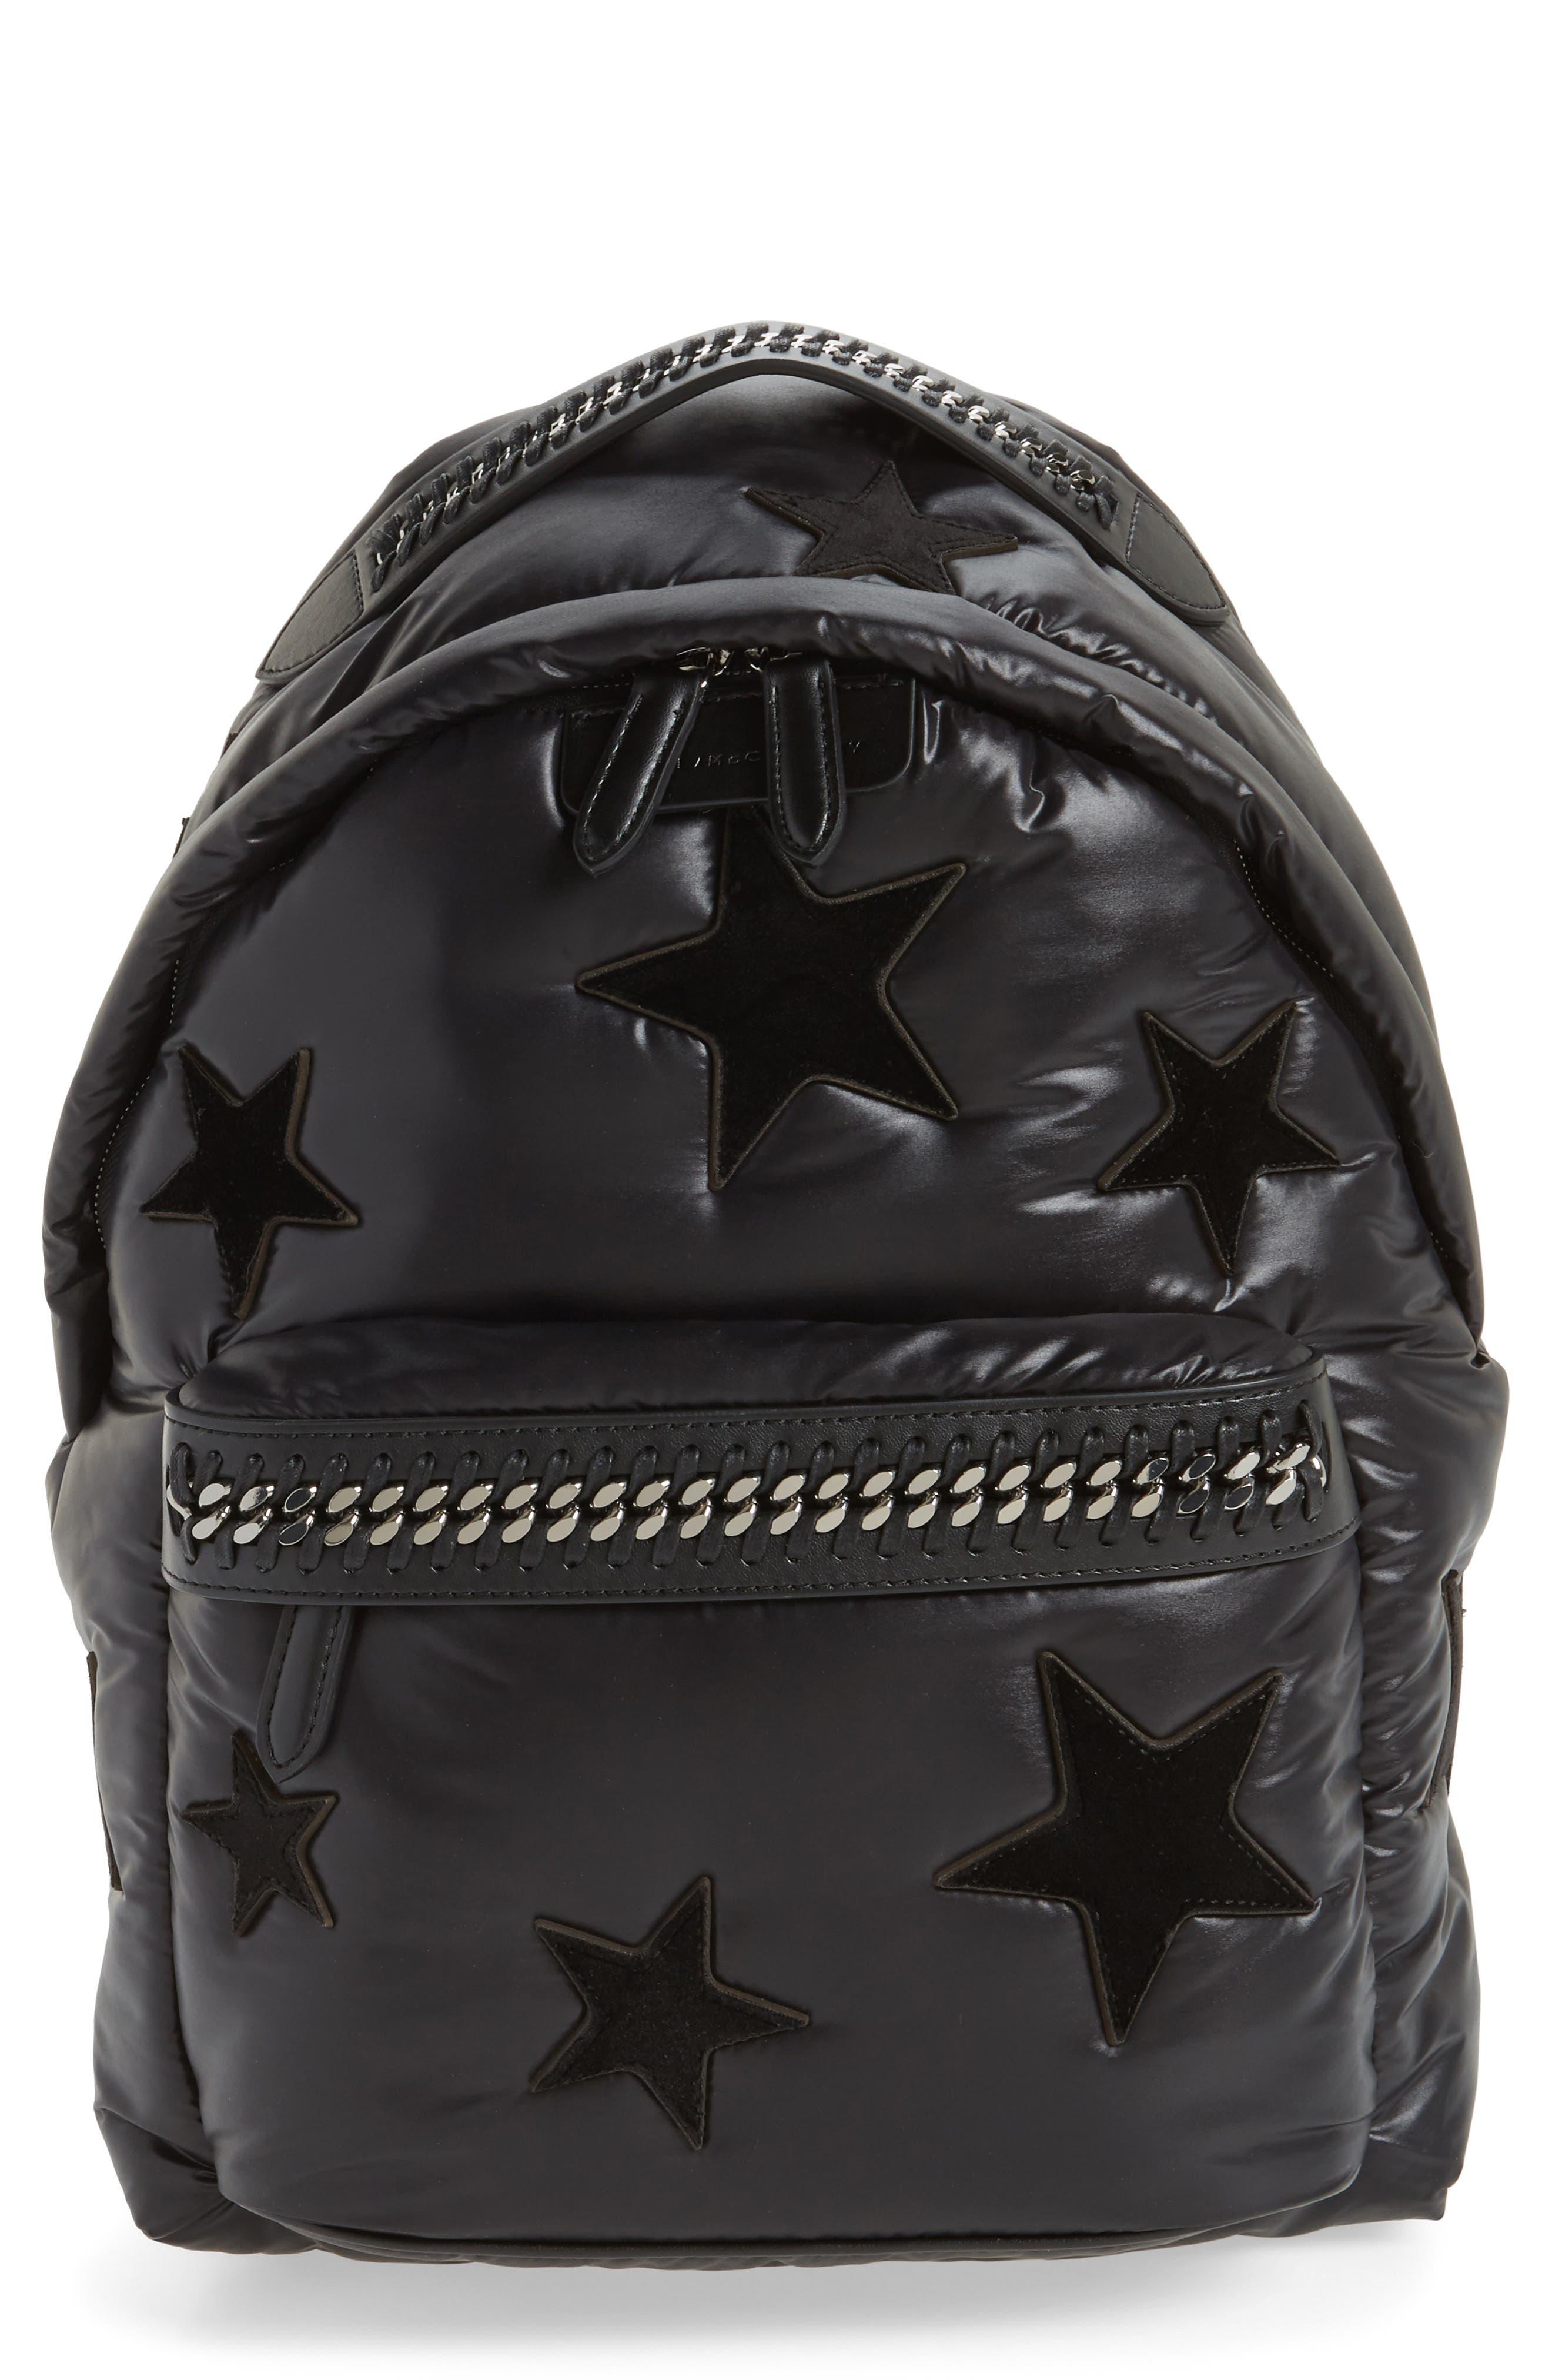 Main Image - Stella McCartney Falabella Go All Over Stars Backpack